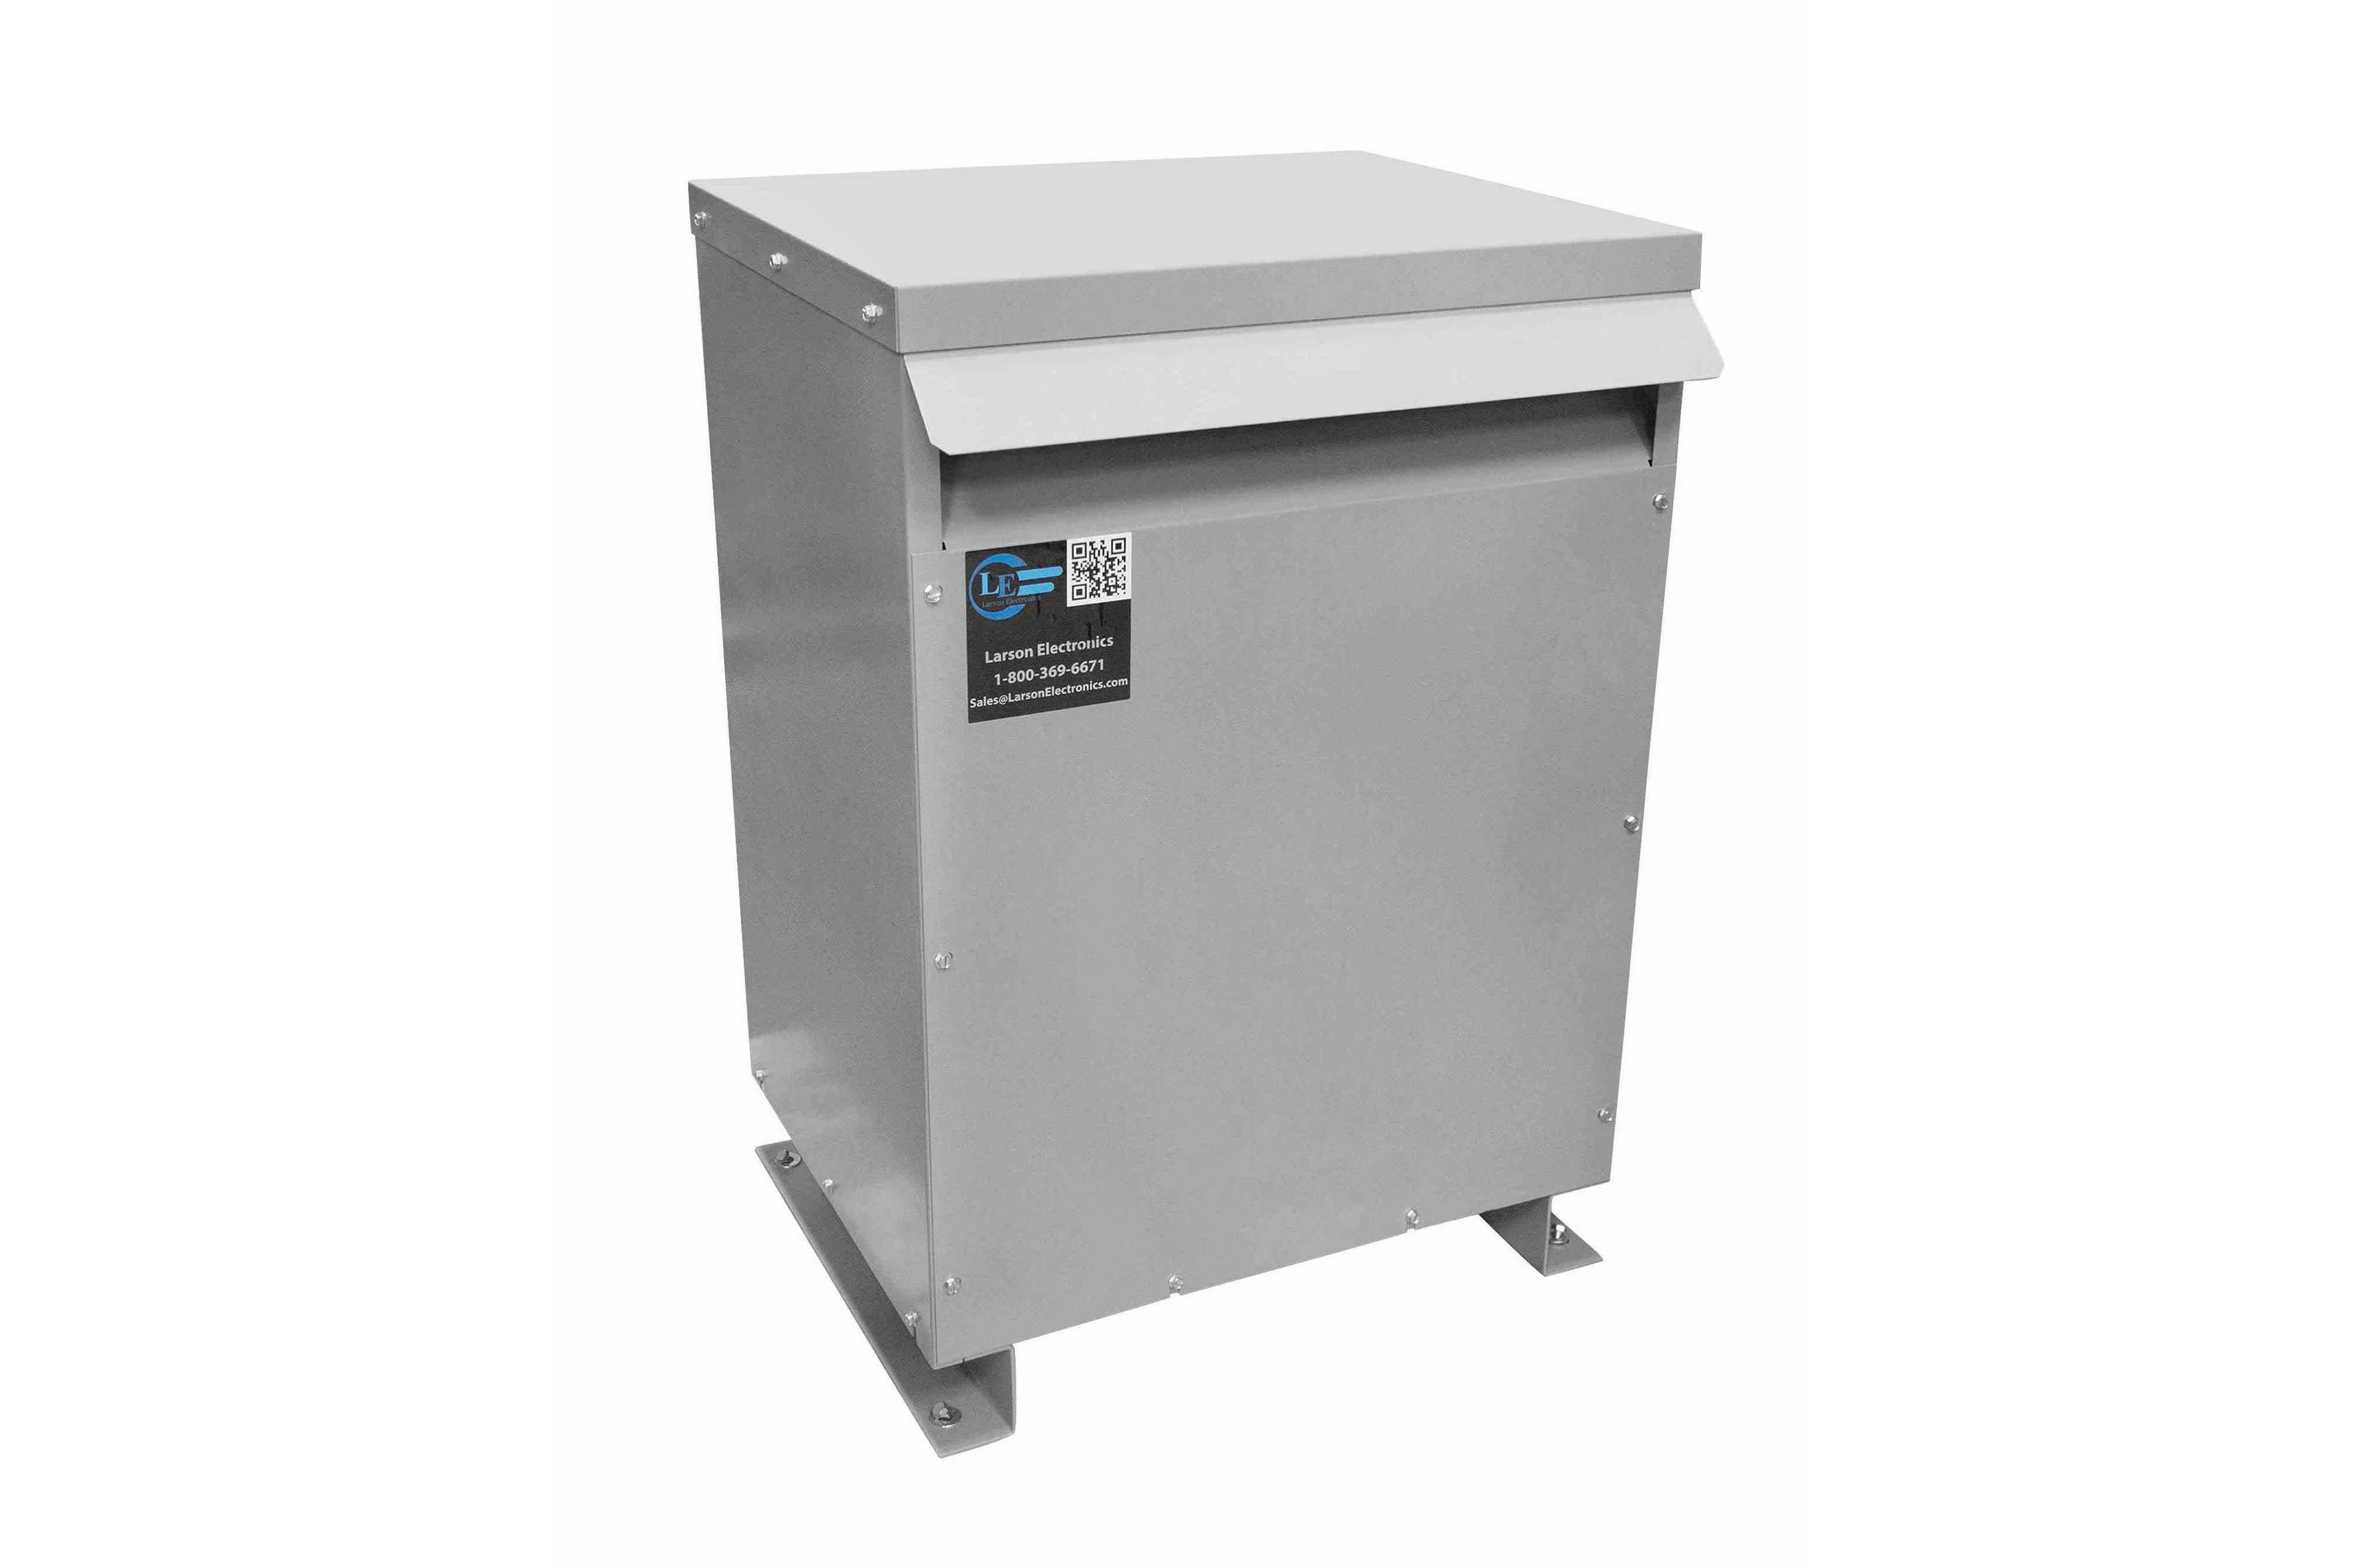 55 kVA 3PH Isolation Transformer, 575V Wye Primary, 400Y/231 Wye-N Secondary, N3R, Ventilated, 60 Hz